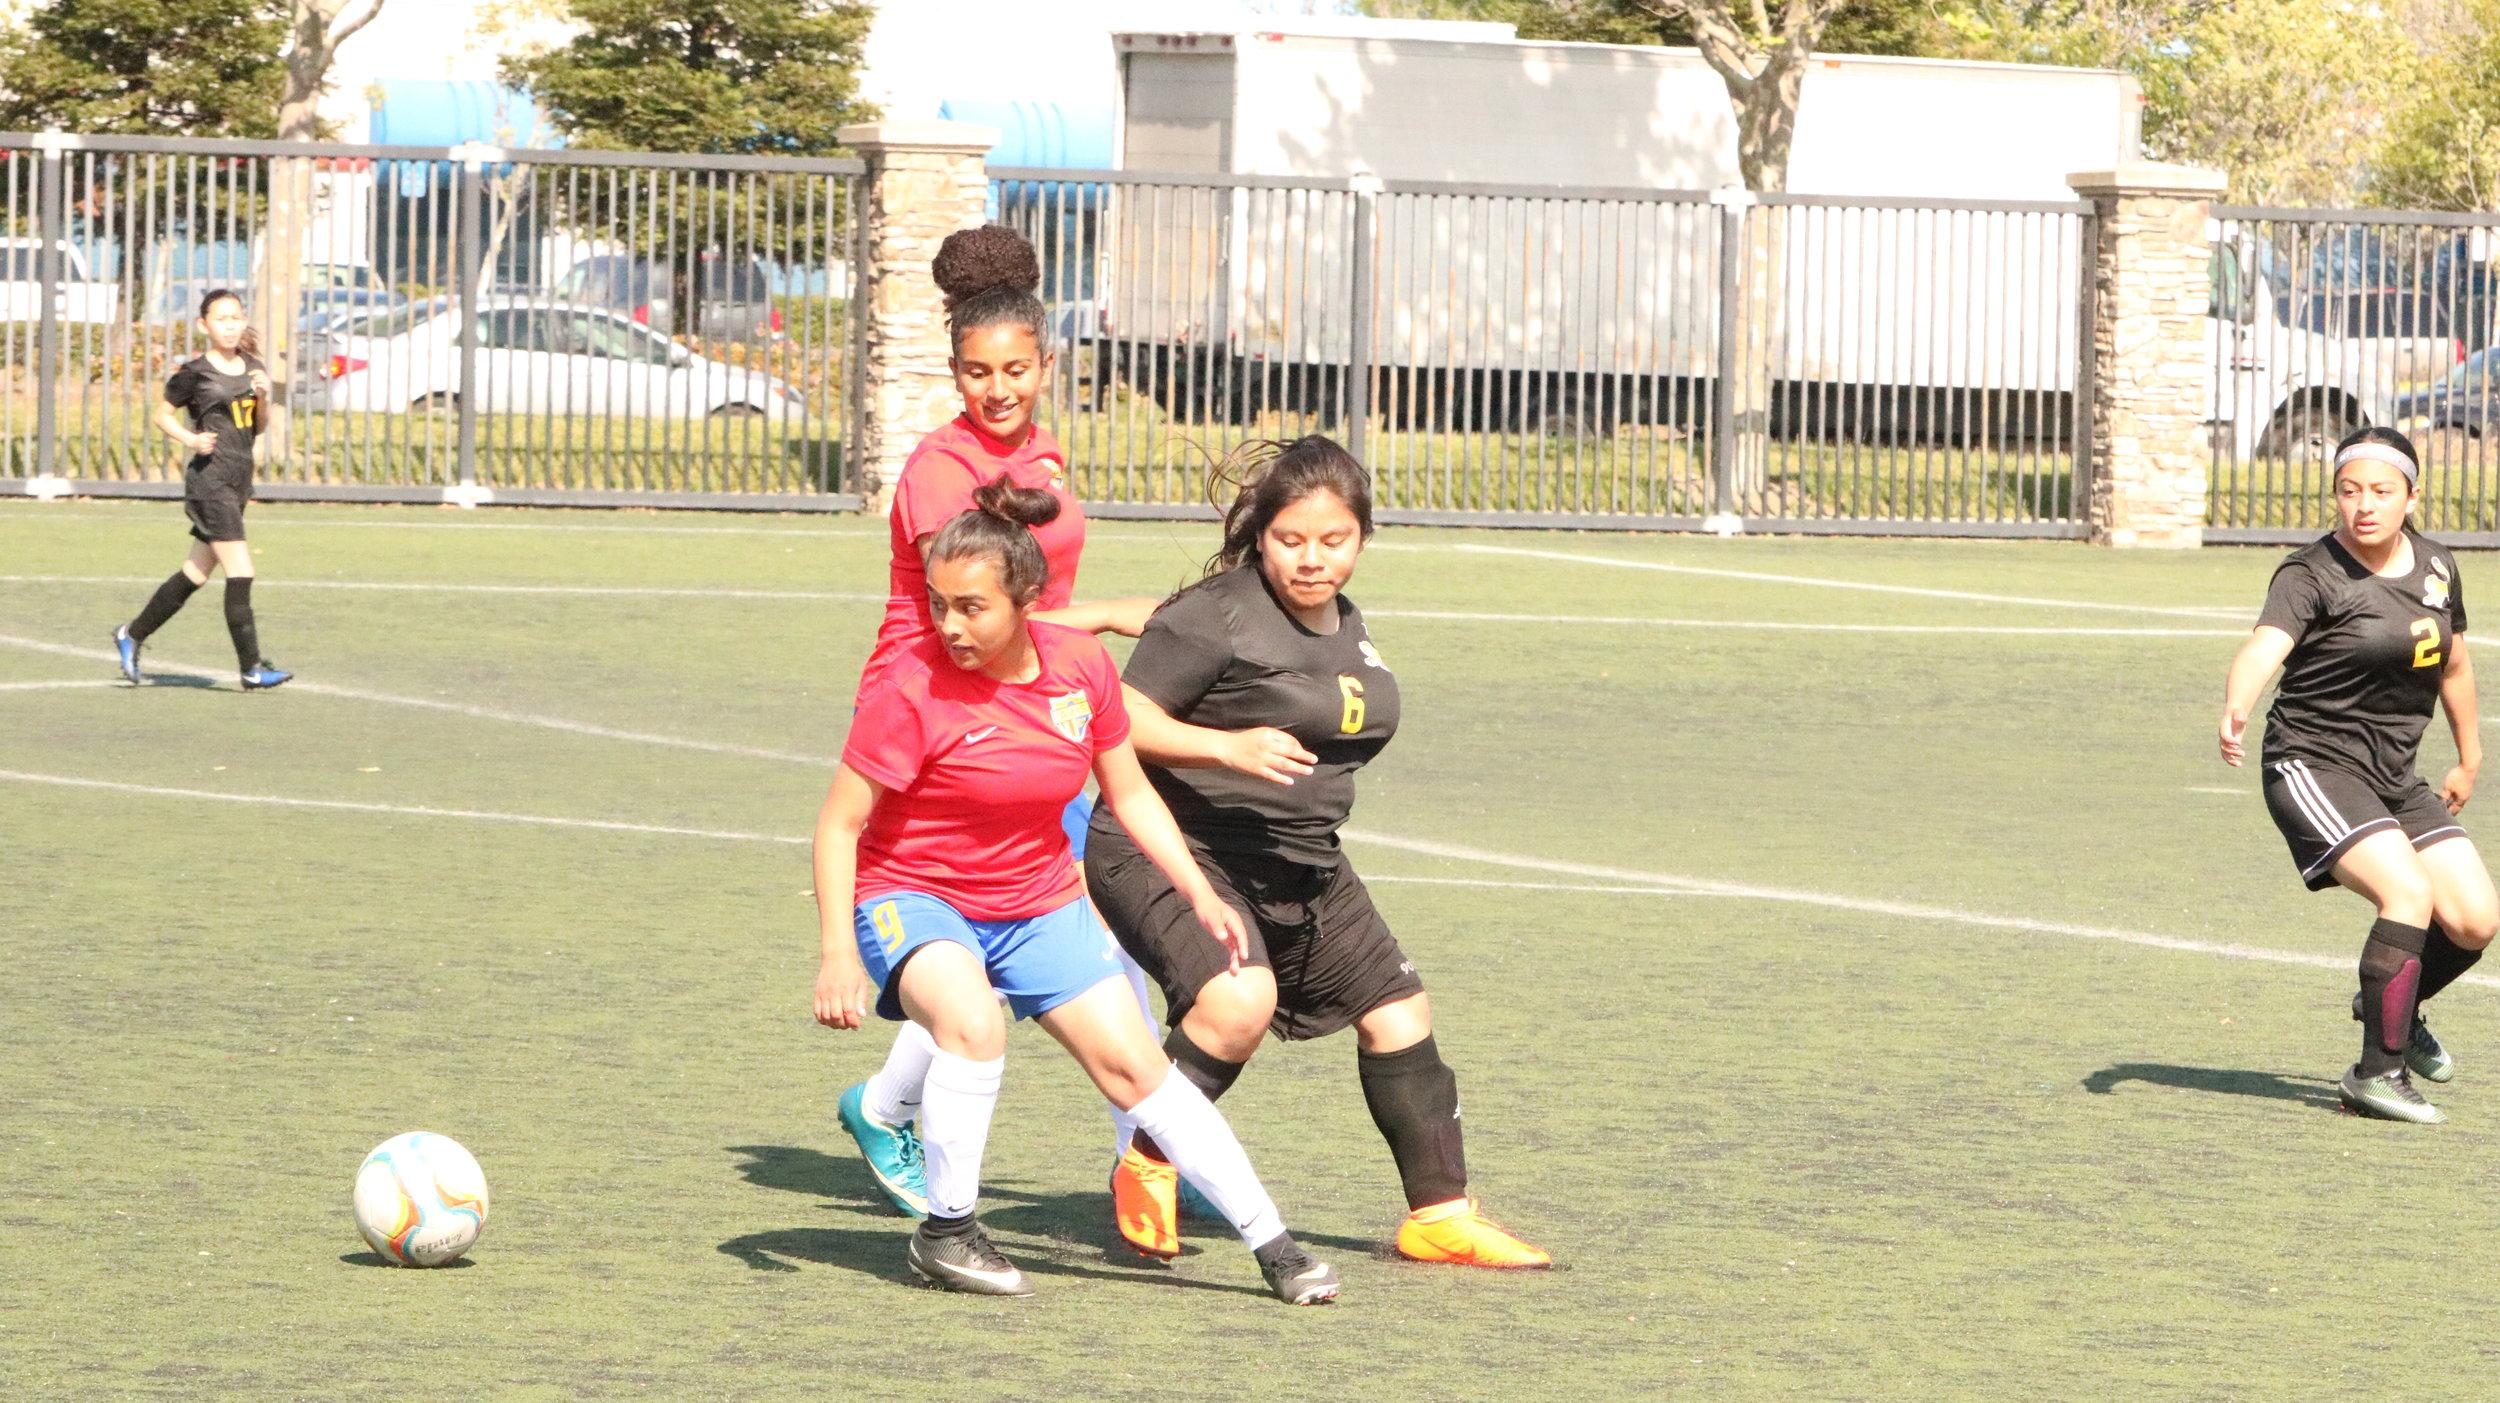 #9 Vanessa Rivas scored her fifth goal of the season.